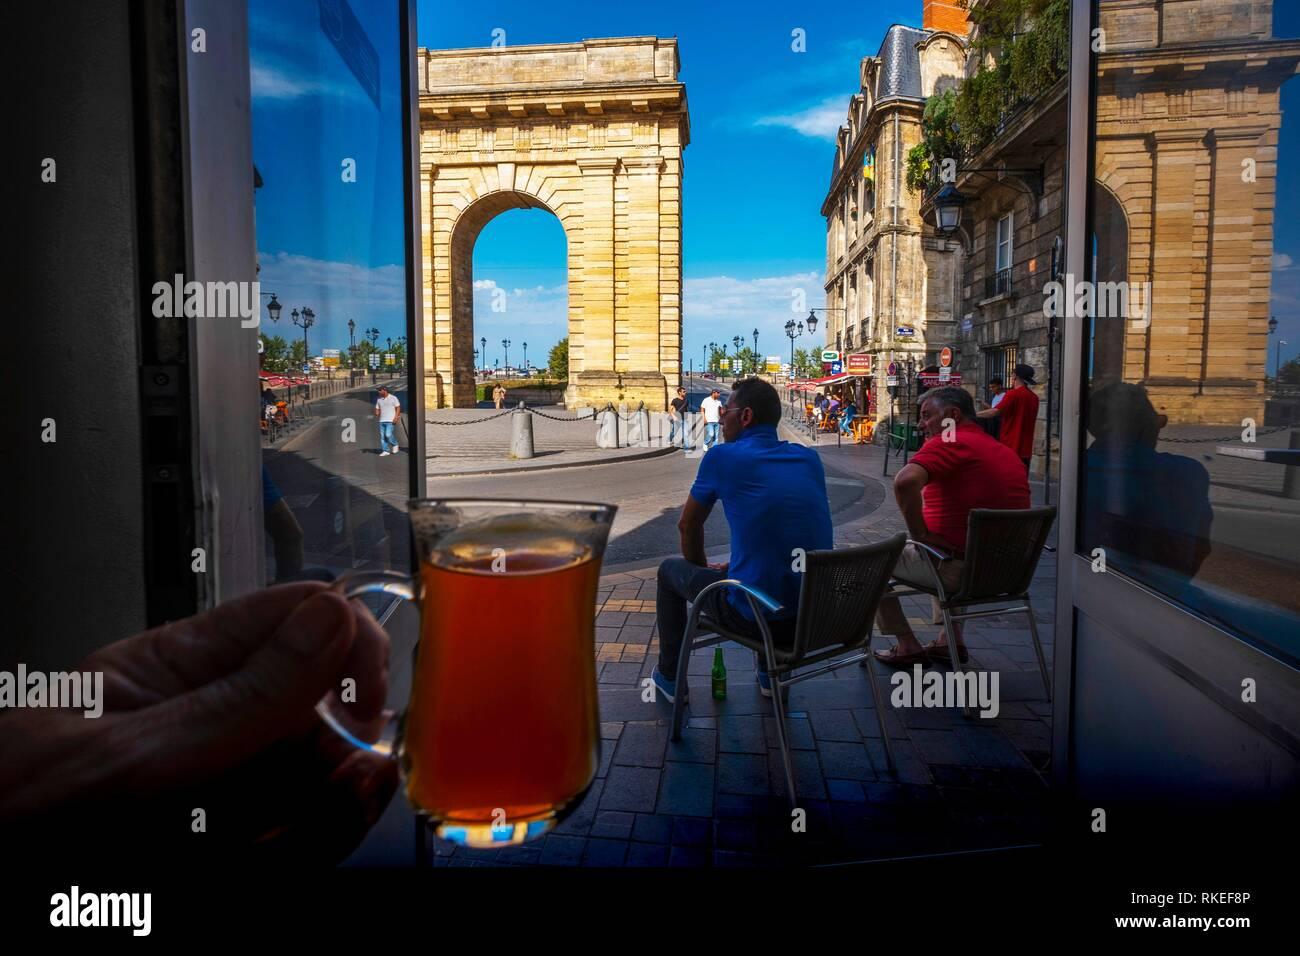 Frankreich, Nouvelle Aquitaine, Gironde, in Tee an die türkische Café ''Le Coin du Sultan'', von ''Porte de Bourgogne'' Tor in Bordeaux. Stockbild